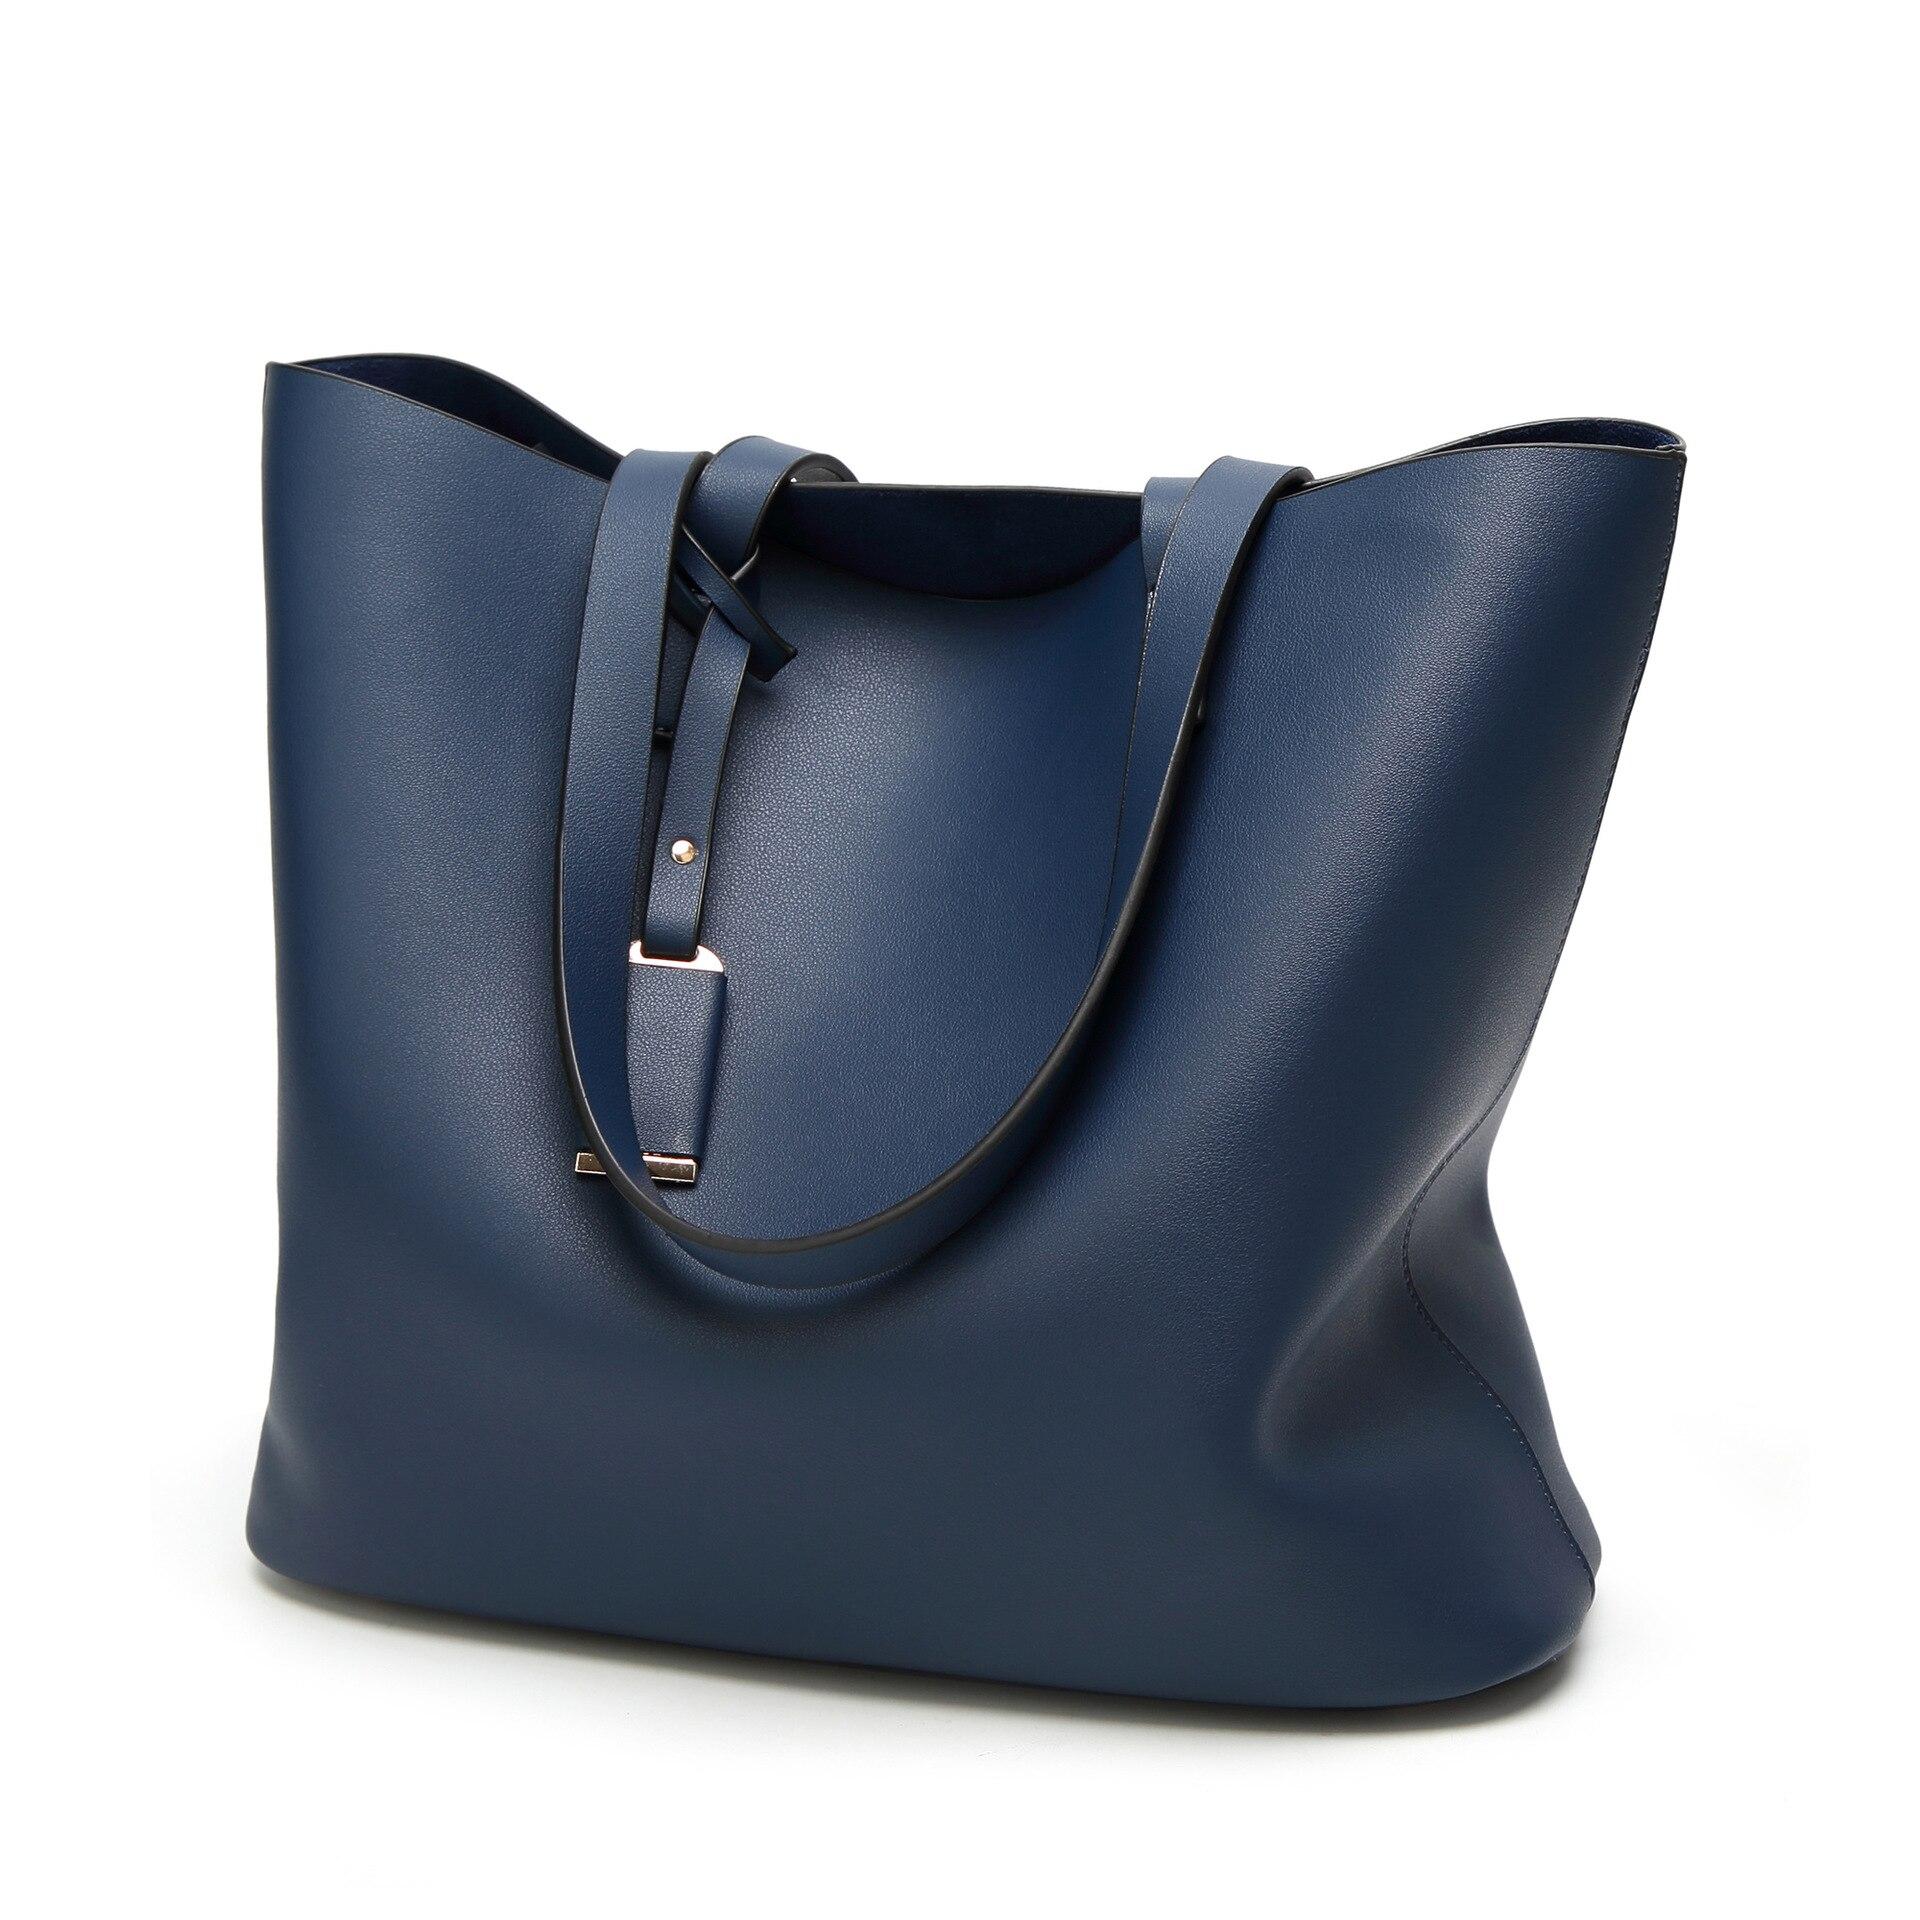 Women's Bag Tote-Bag Shoulder Portable Fashion Ladies Joker Urethane Poly Casual New